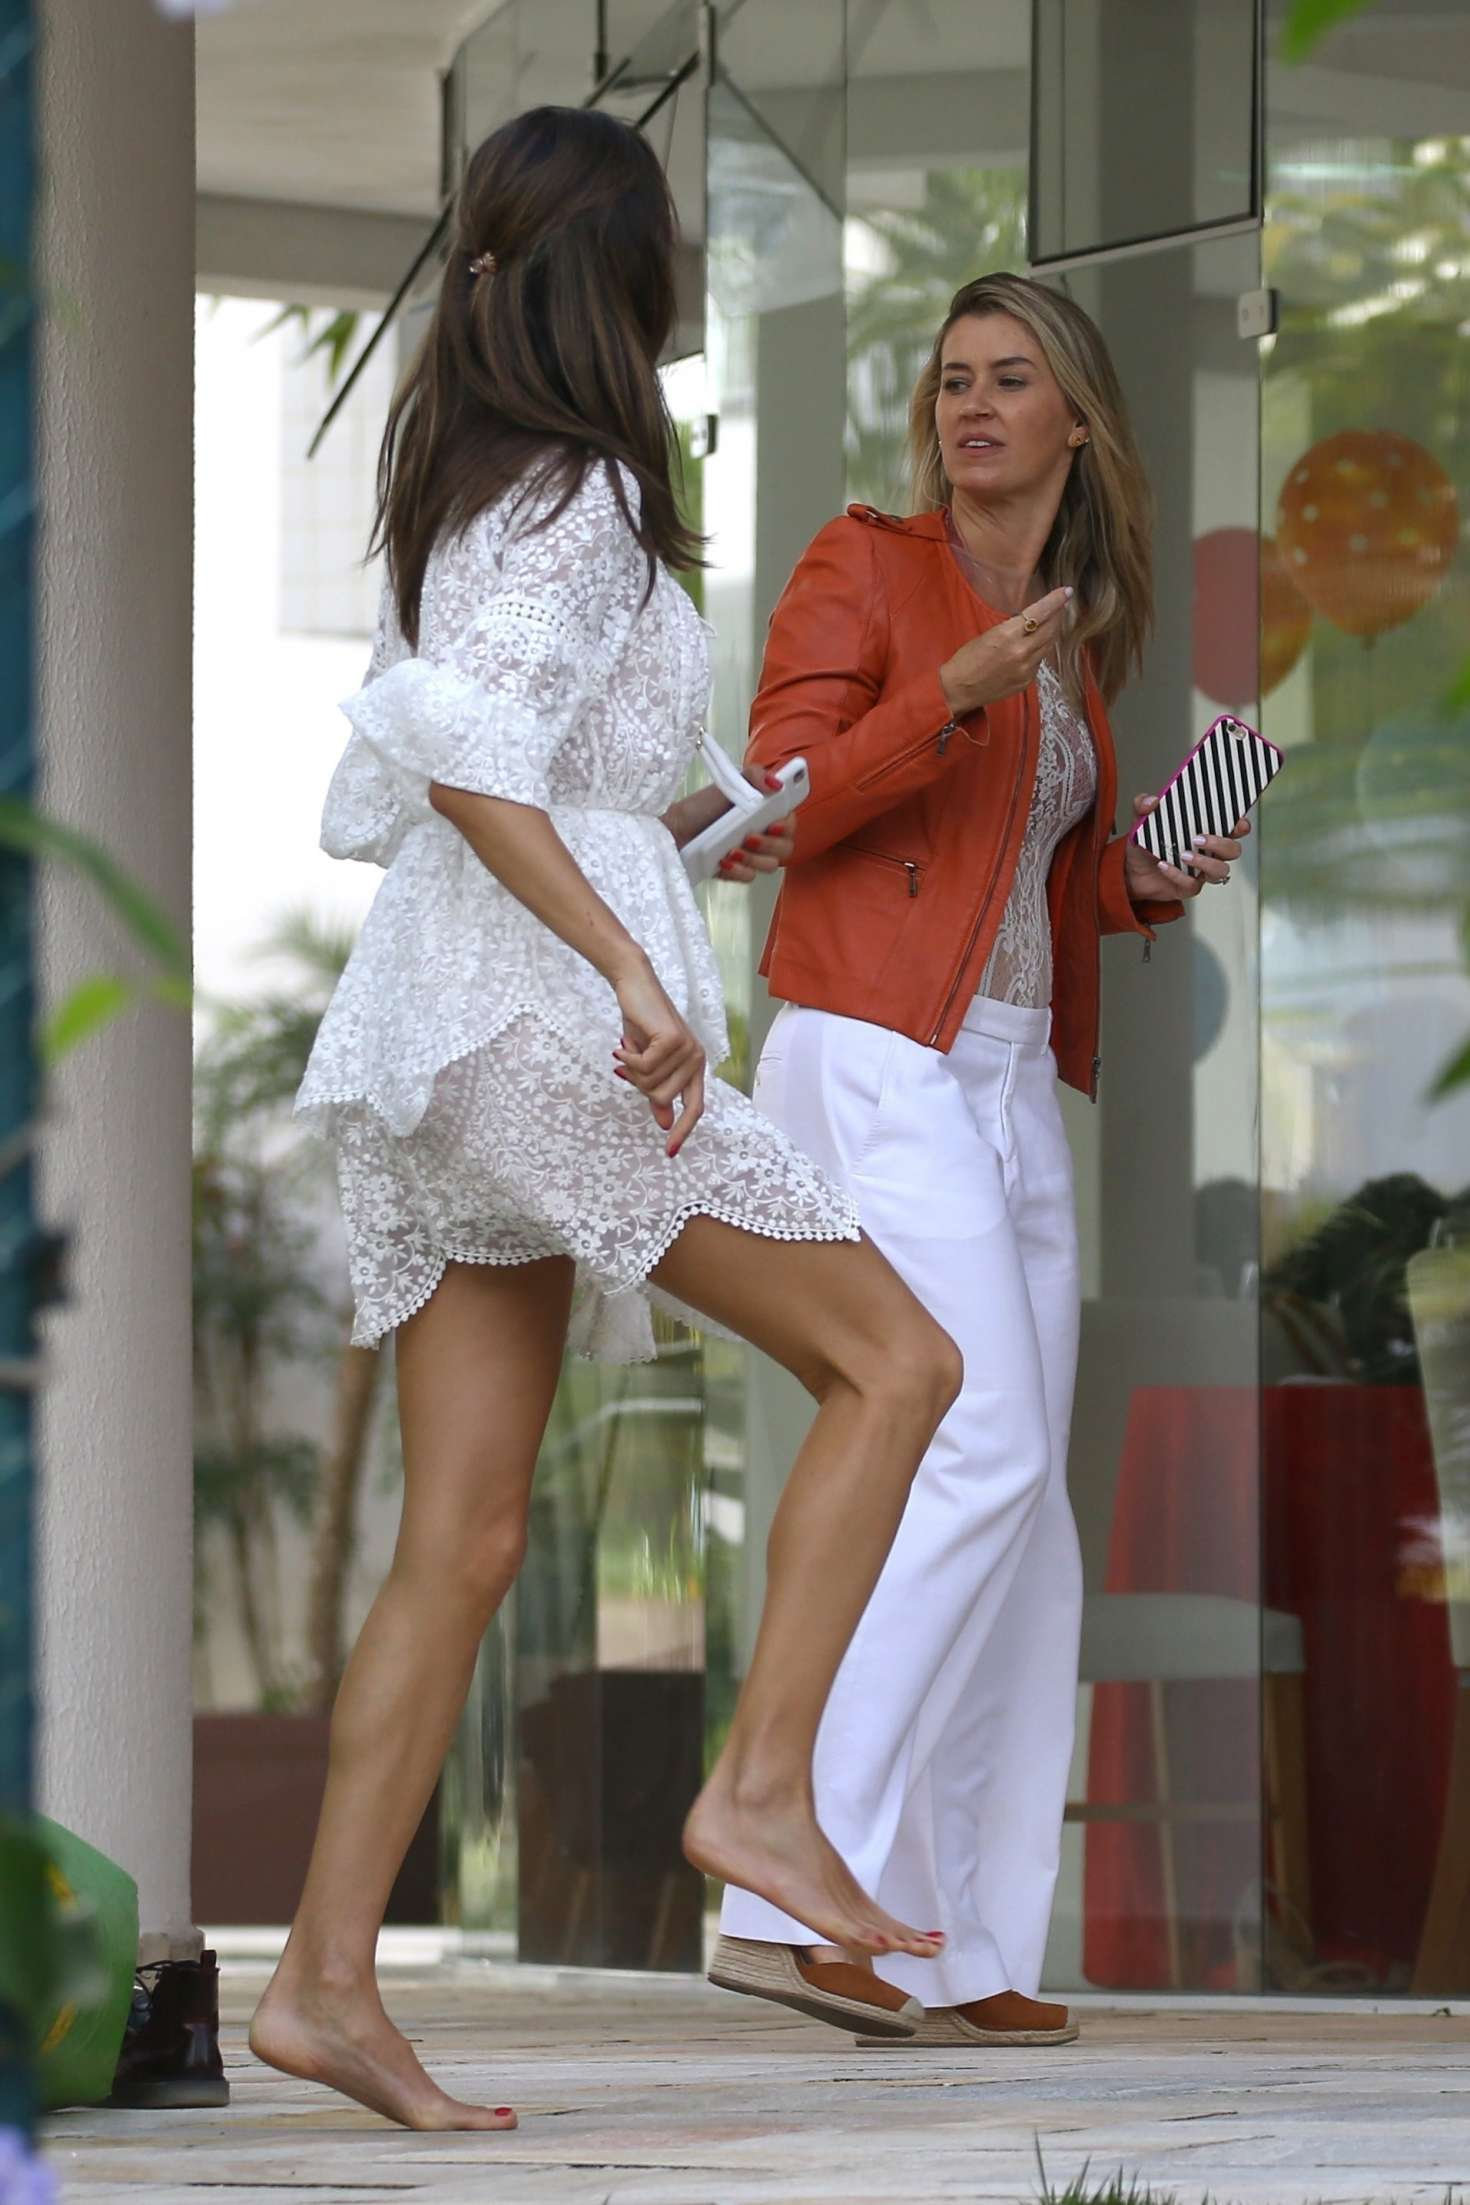 Alessandra Ambrosio enjoys her cousin's Disney party in Florianopolis